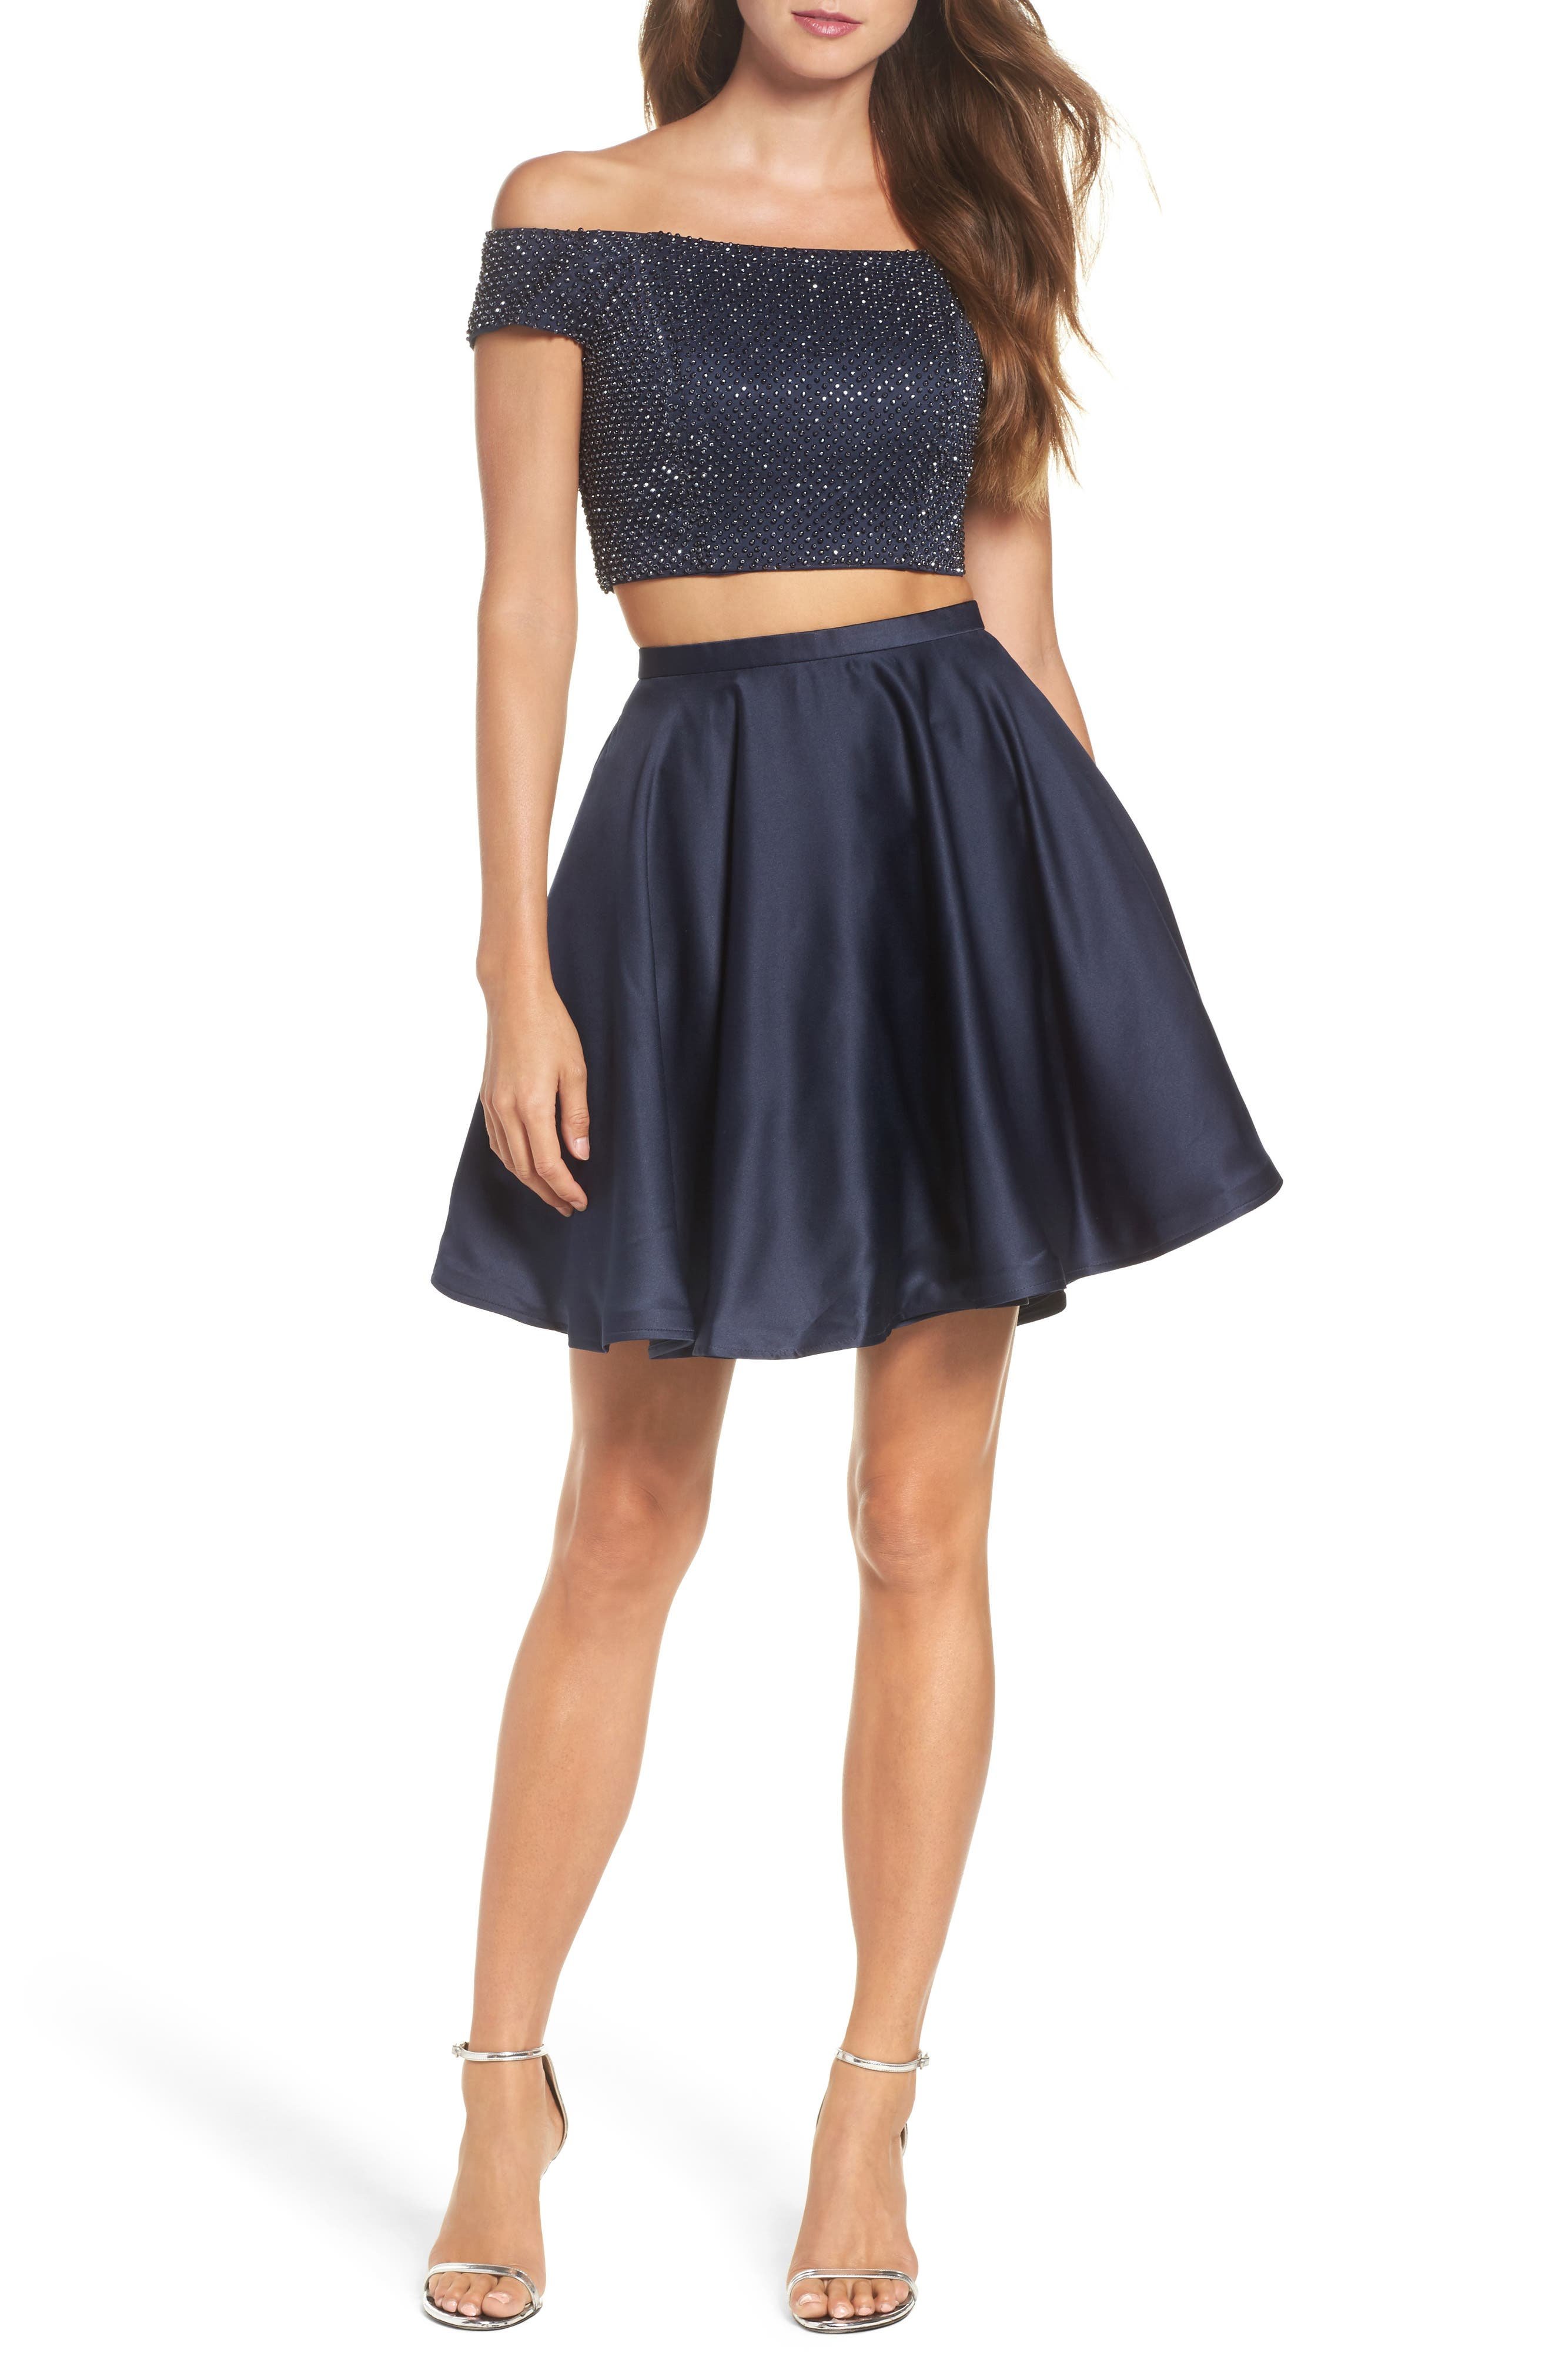 La Femme Off the Shoulder Two-Piece Fit & Flare Dress